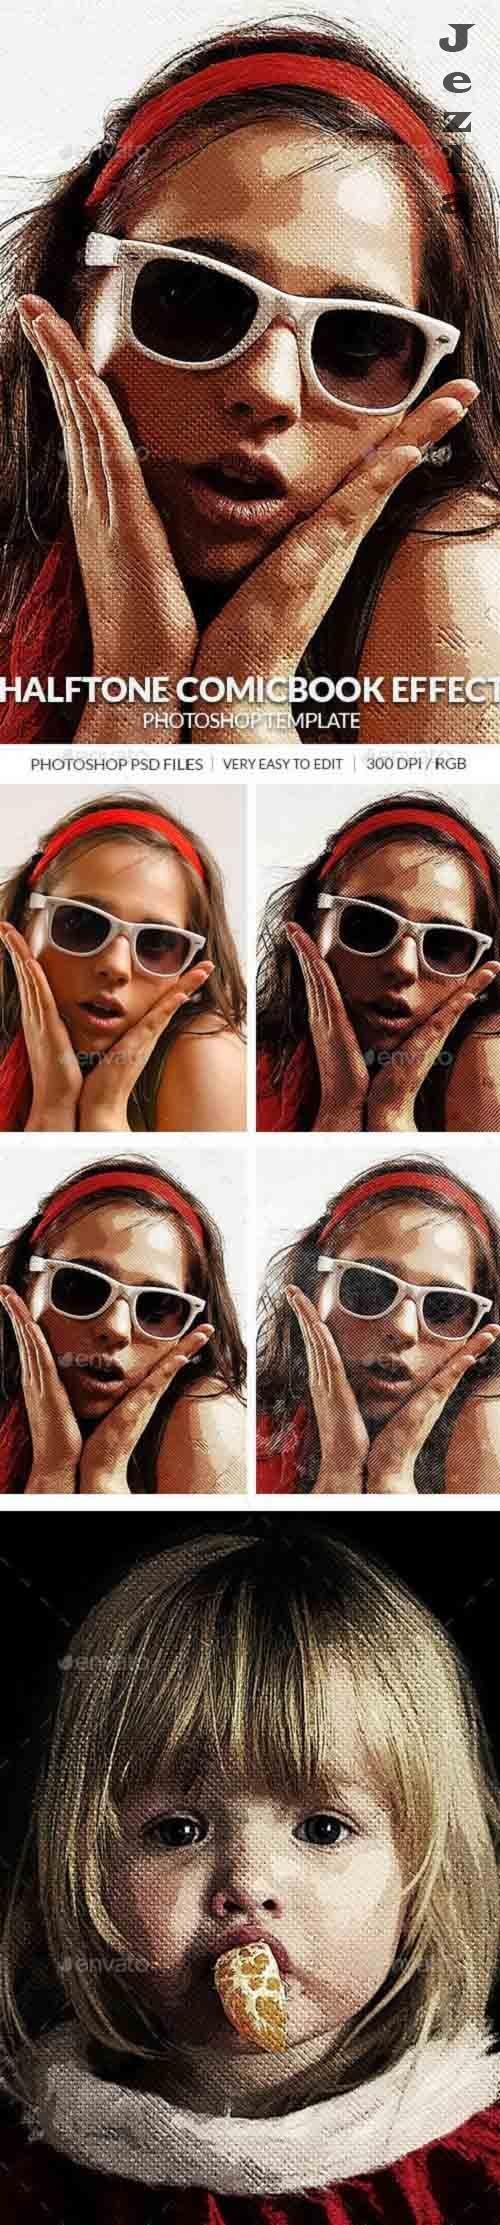 GraphicRiver - Halftone Comcbook Photo Effect Template 30408933